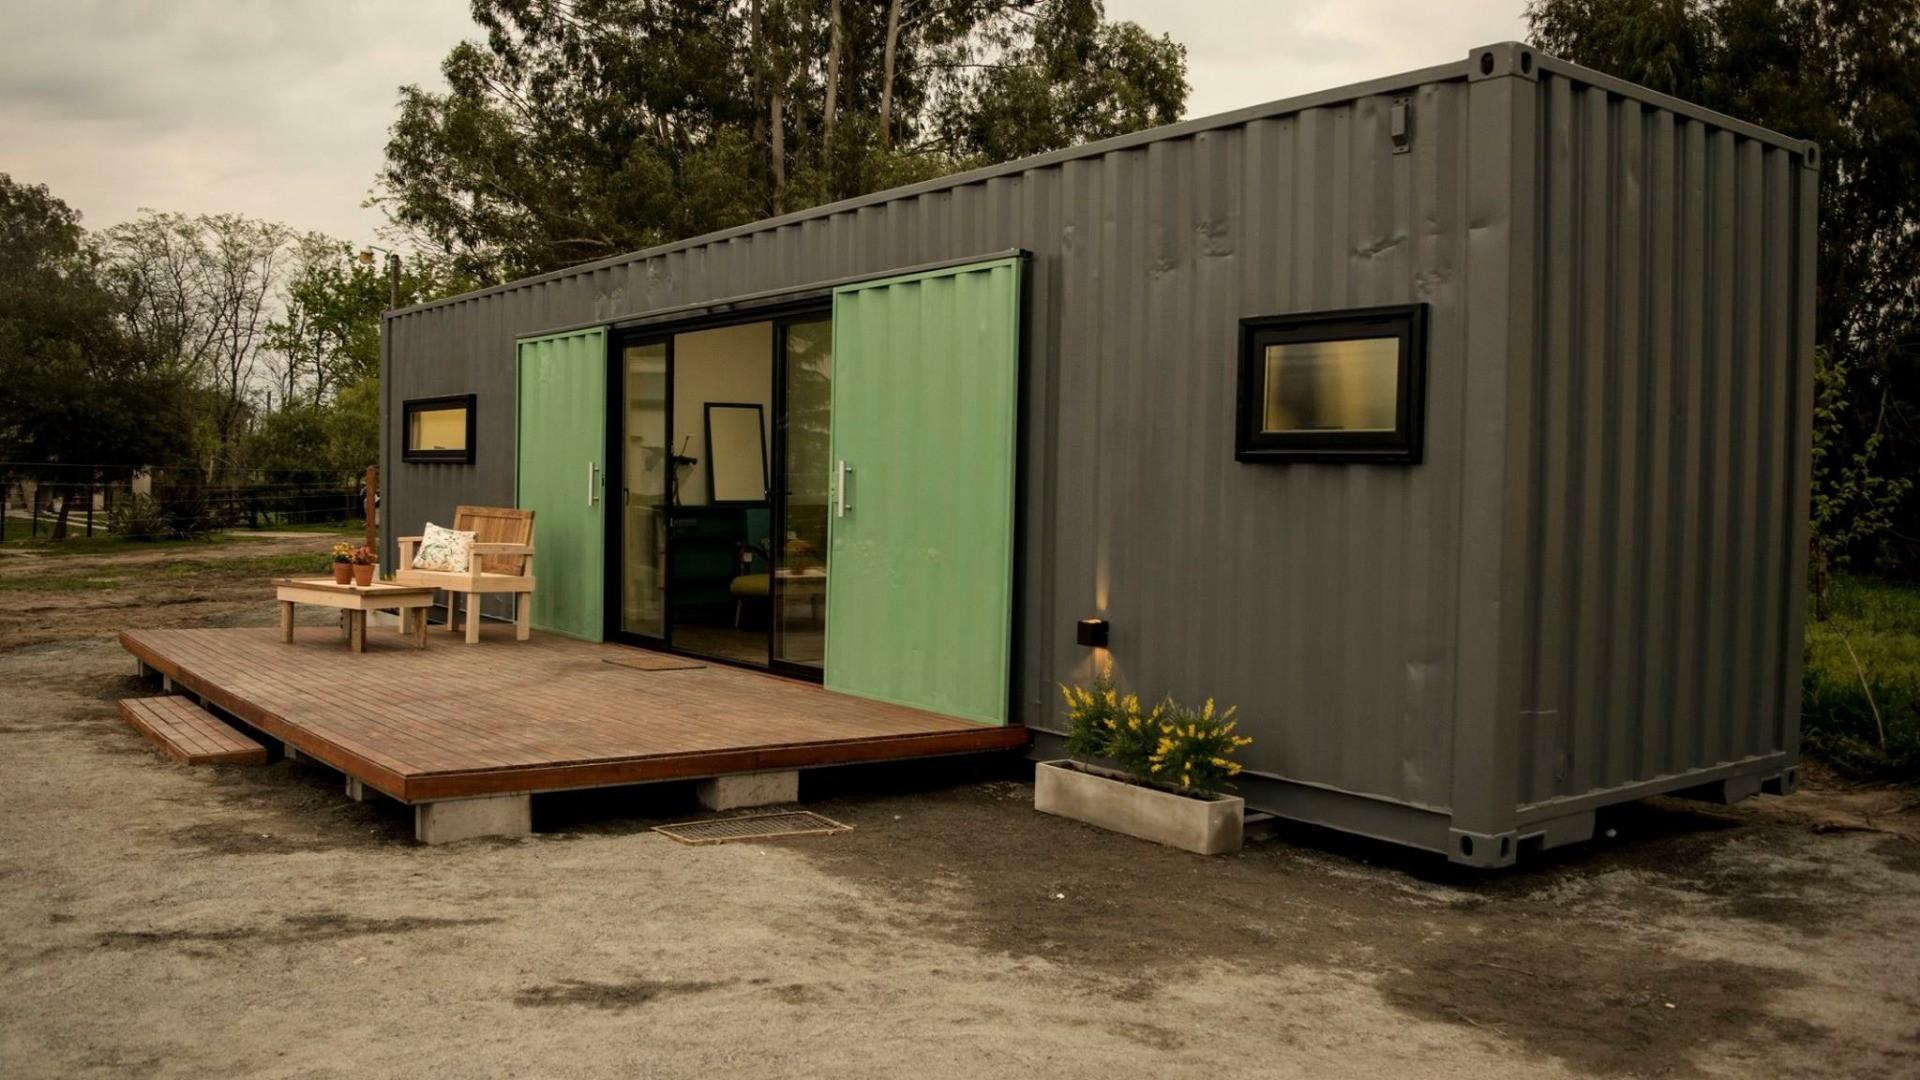 Casa en venta en casas container con lo ultimo en dise o for Diseno de oficinas con contenedores